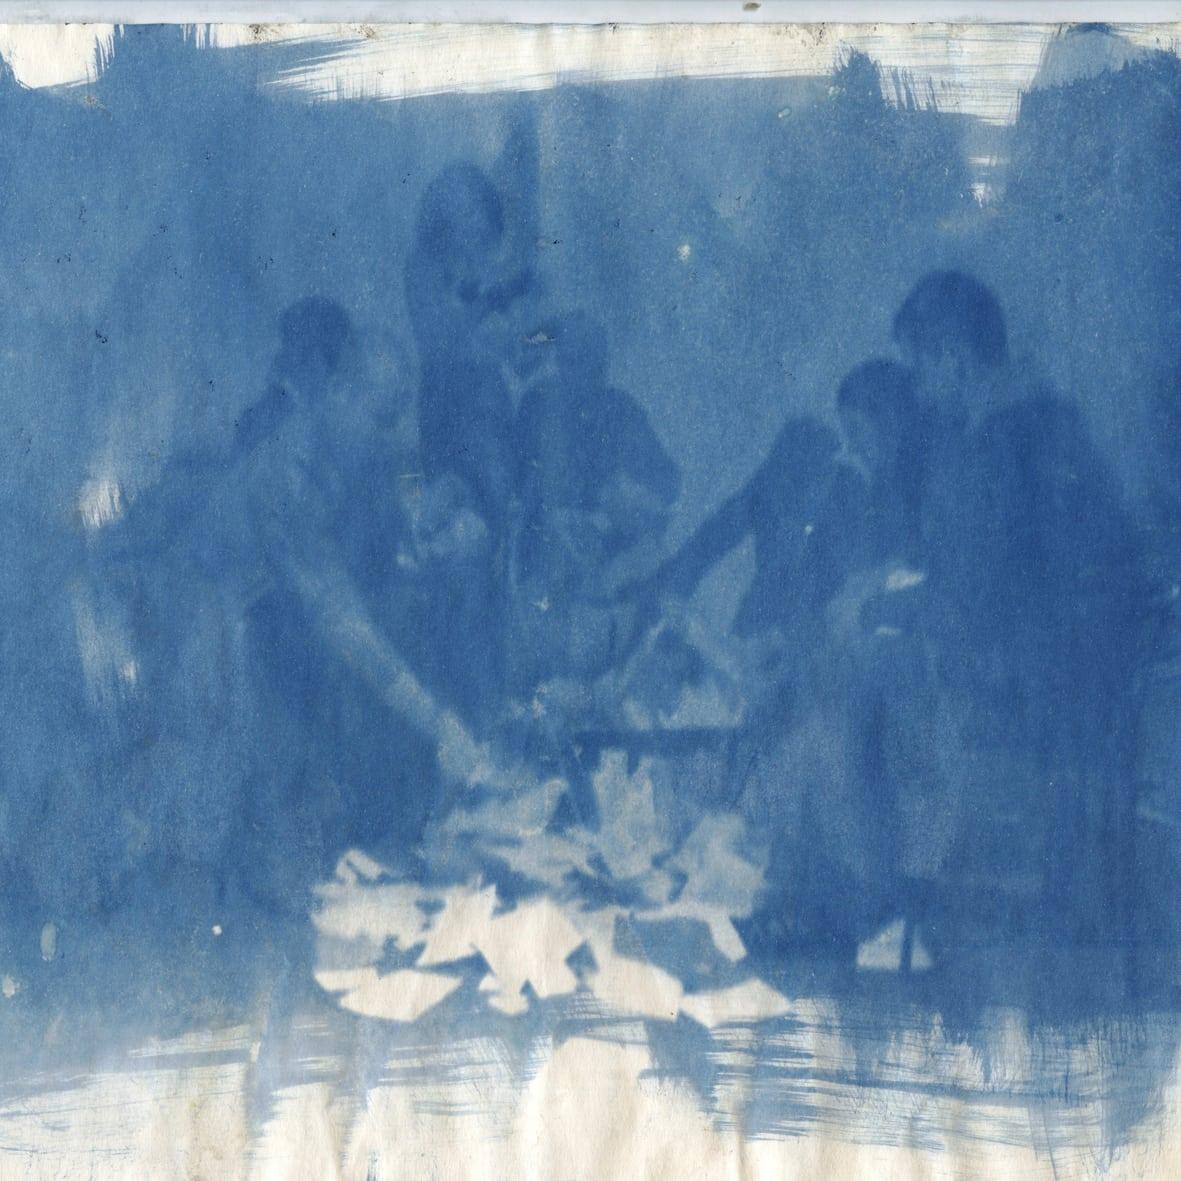 AUB postgraduate exhibition is 'Dust'